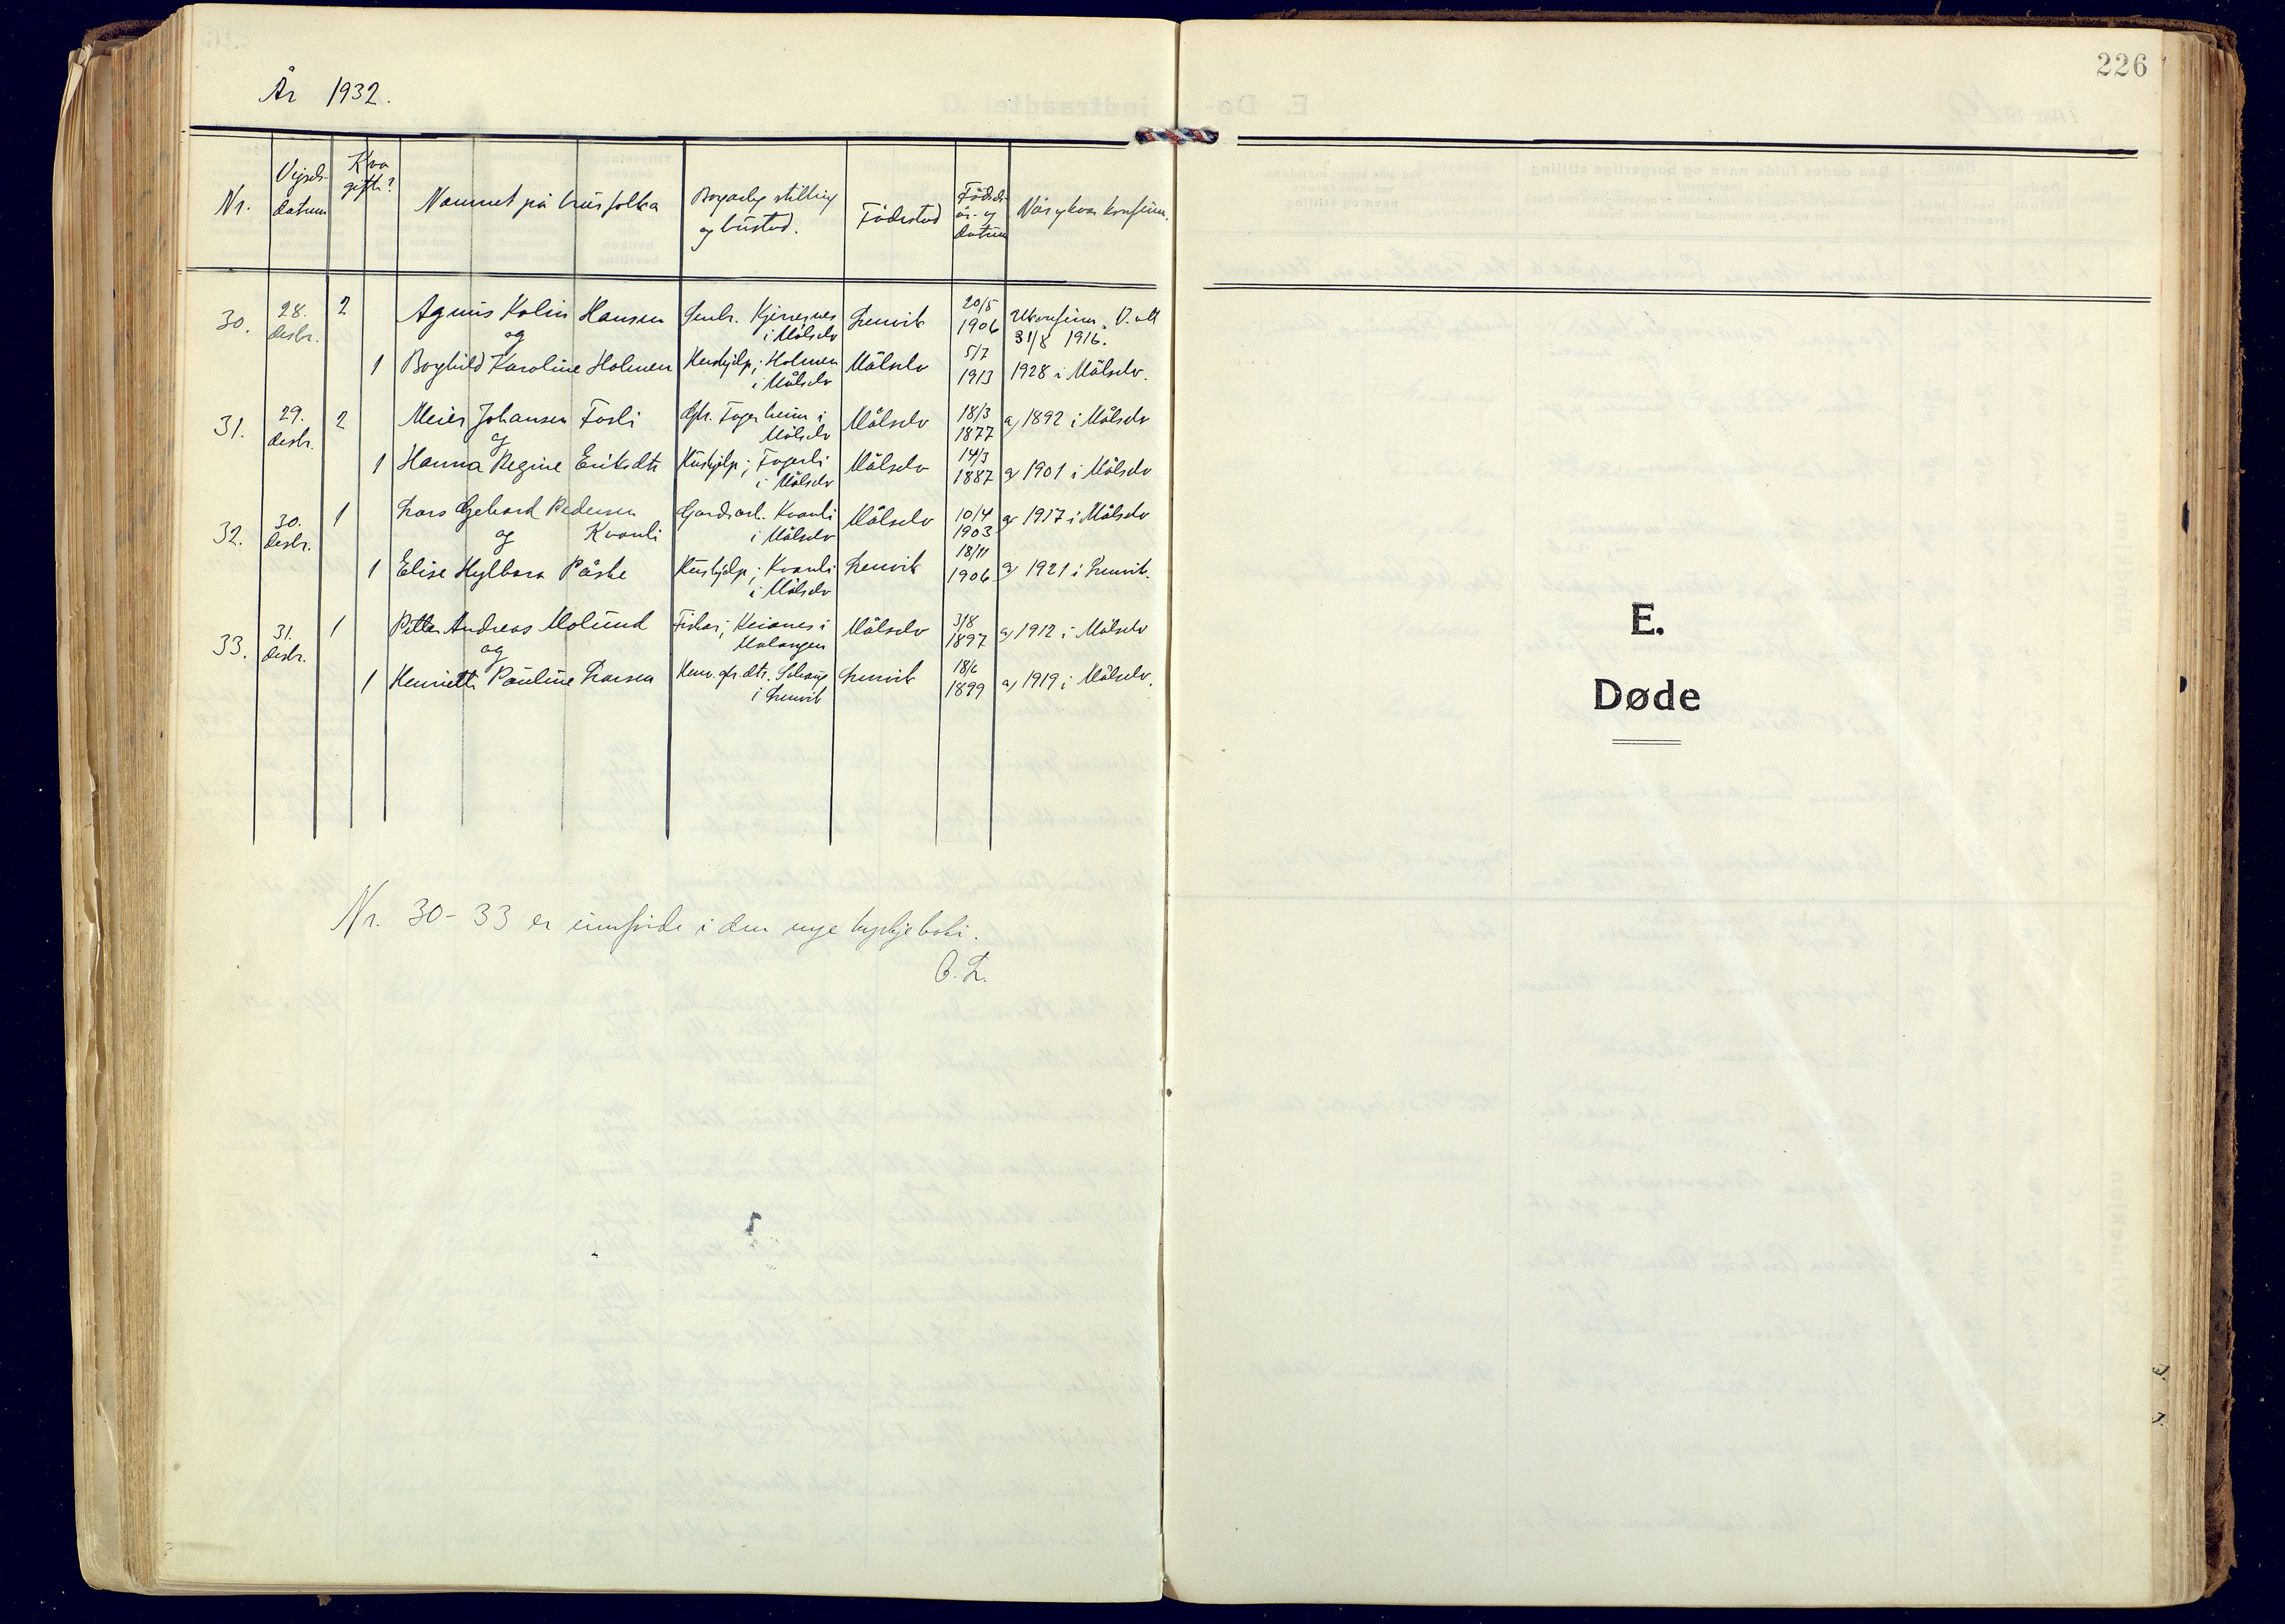 SATØ, Målselv sokneprestembete, Ministerialbok nr. 14, 1919-1932, s. 226